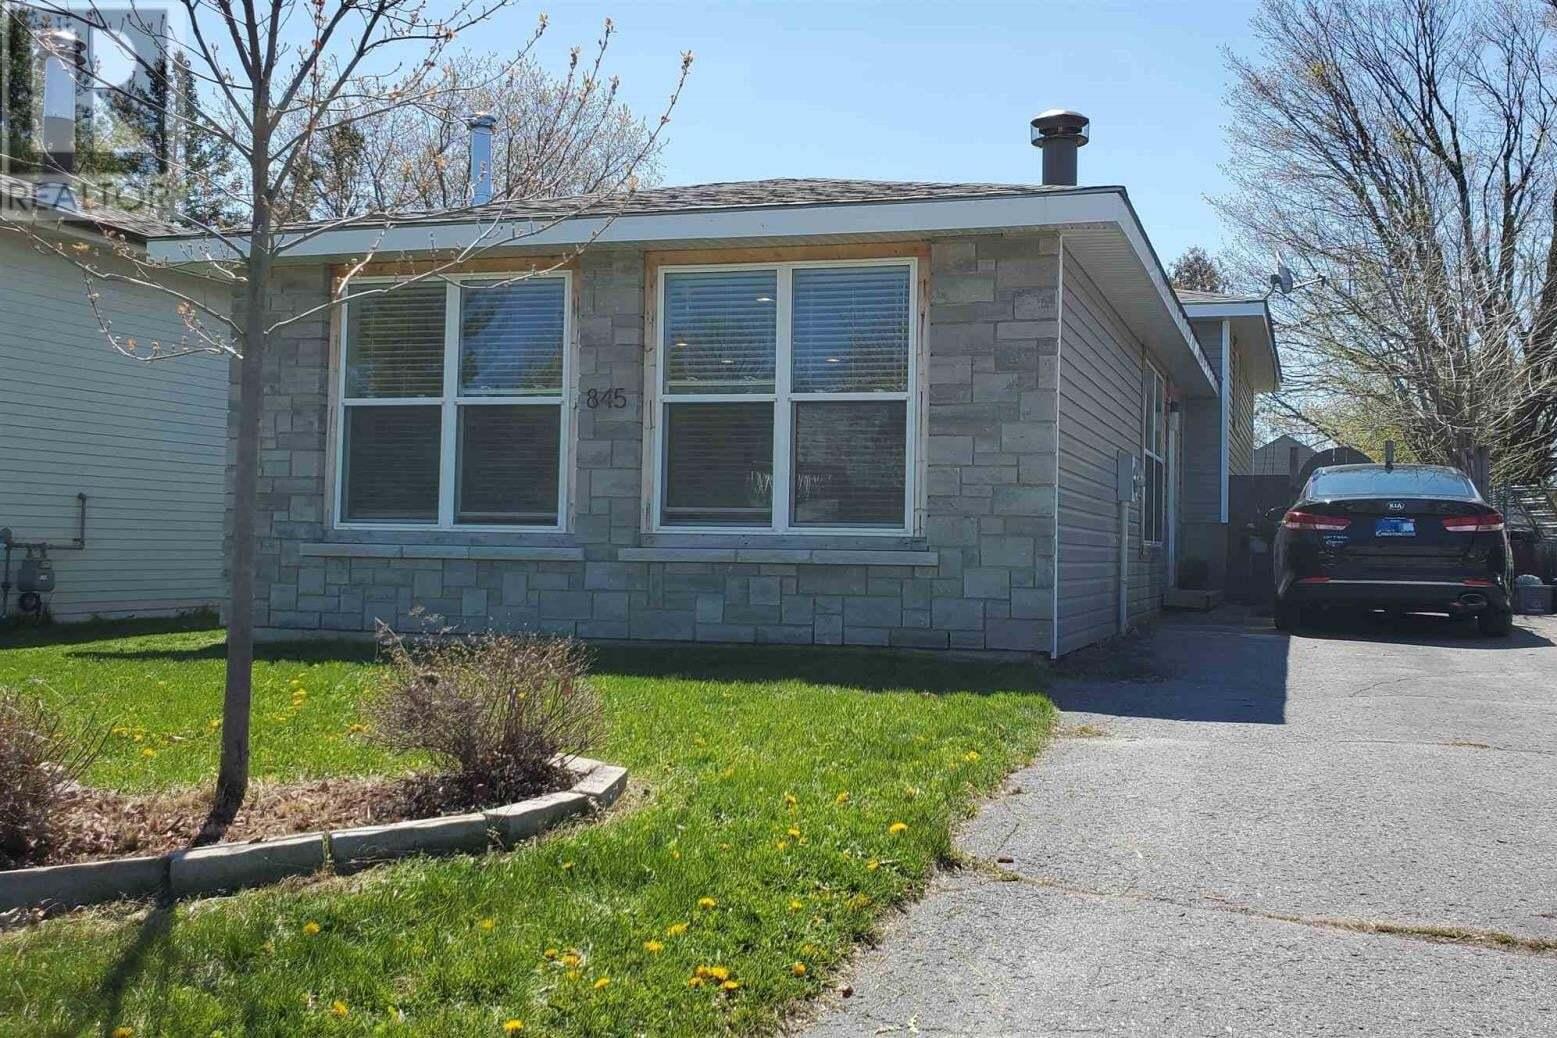 House for sale at 845 Cedarwood Dr Kingston Ontario - MLS: K20002404